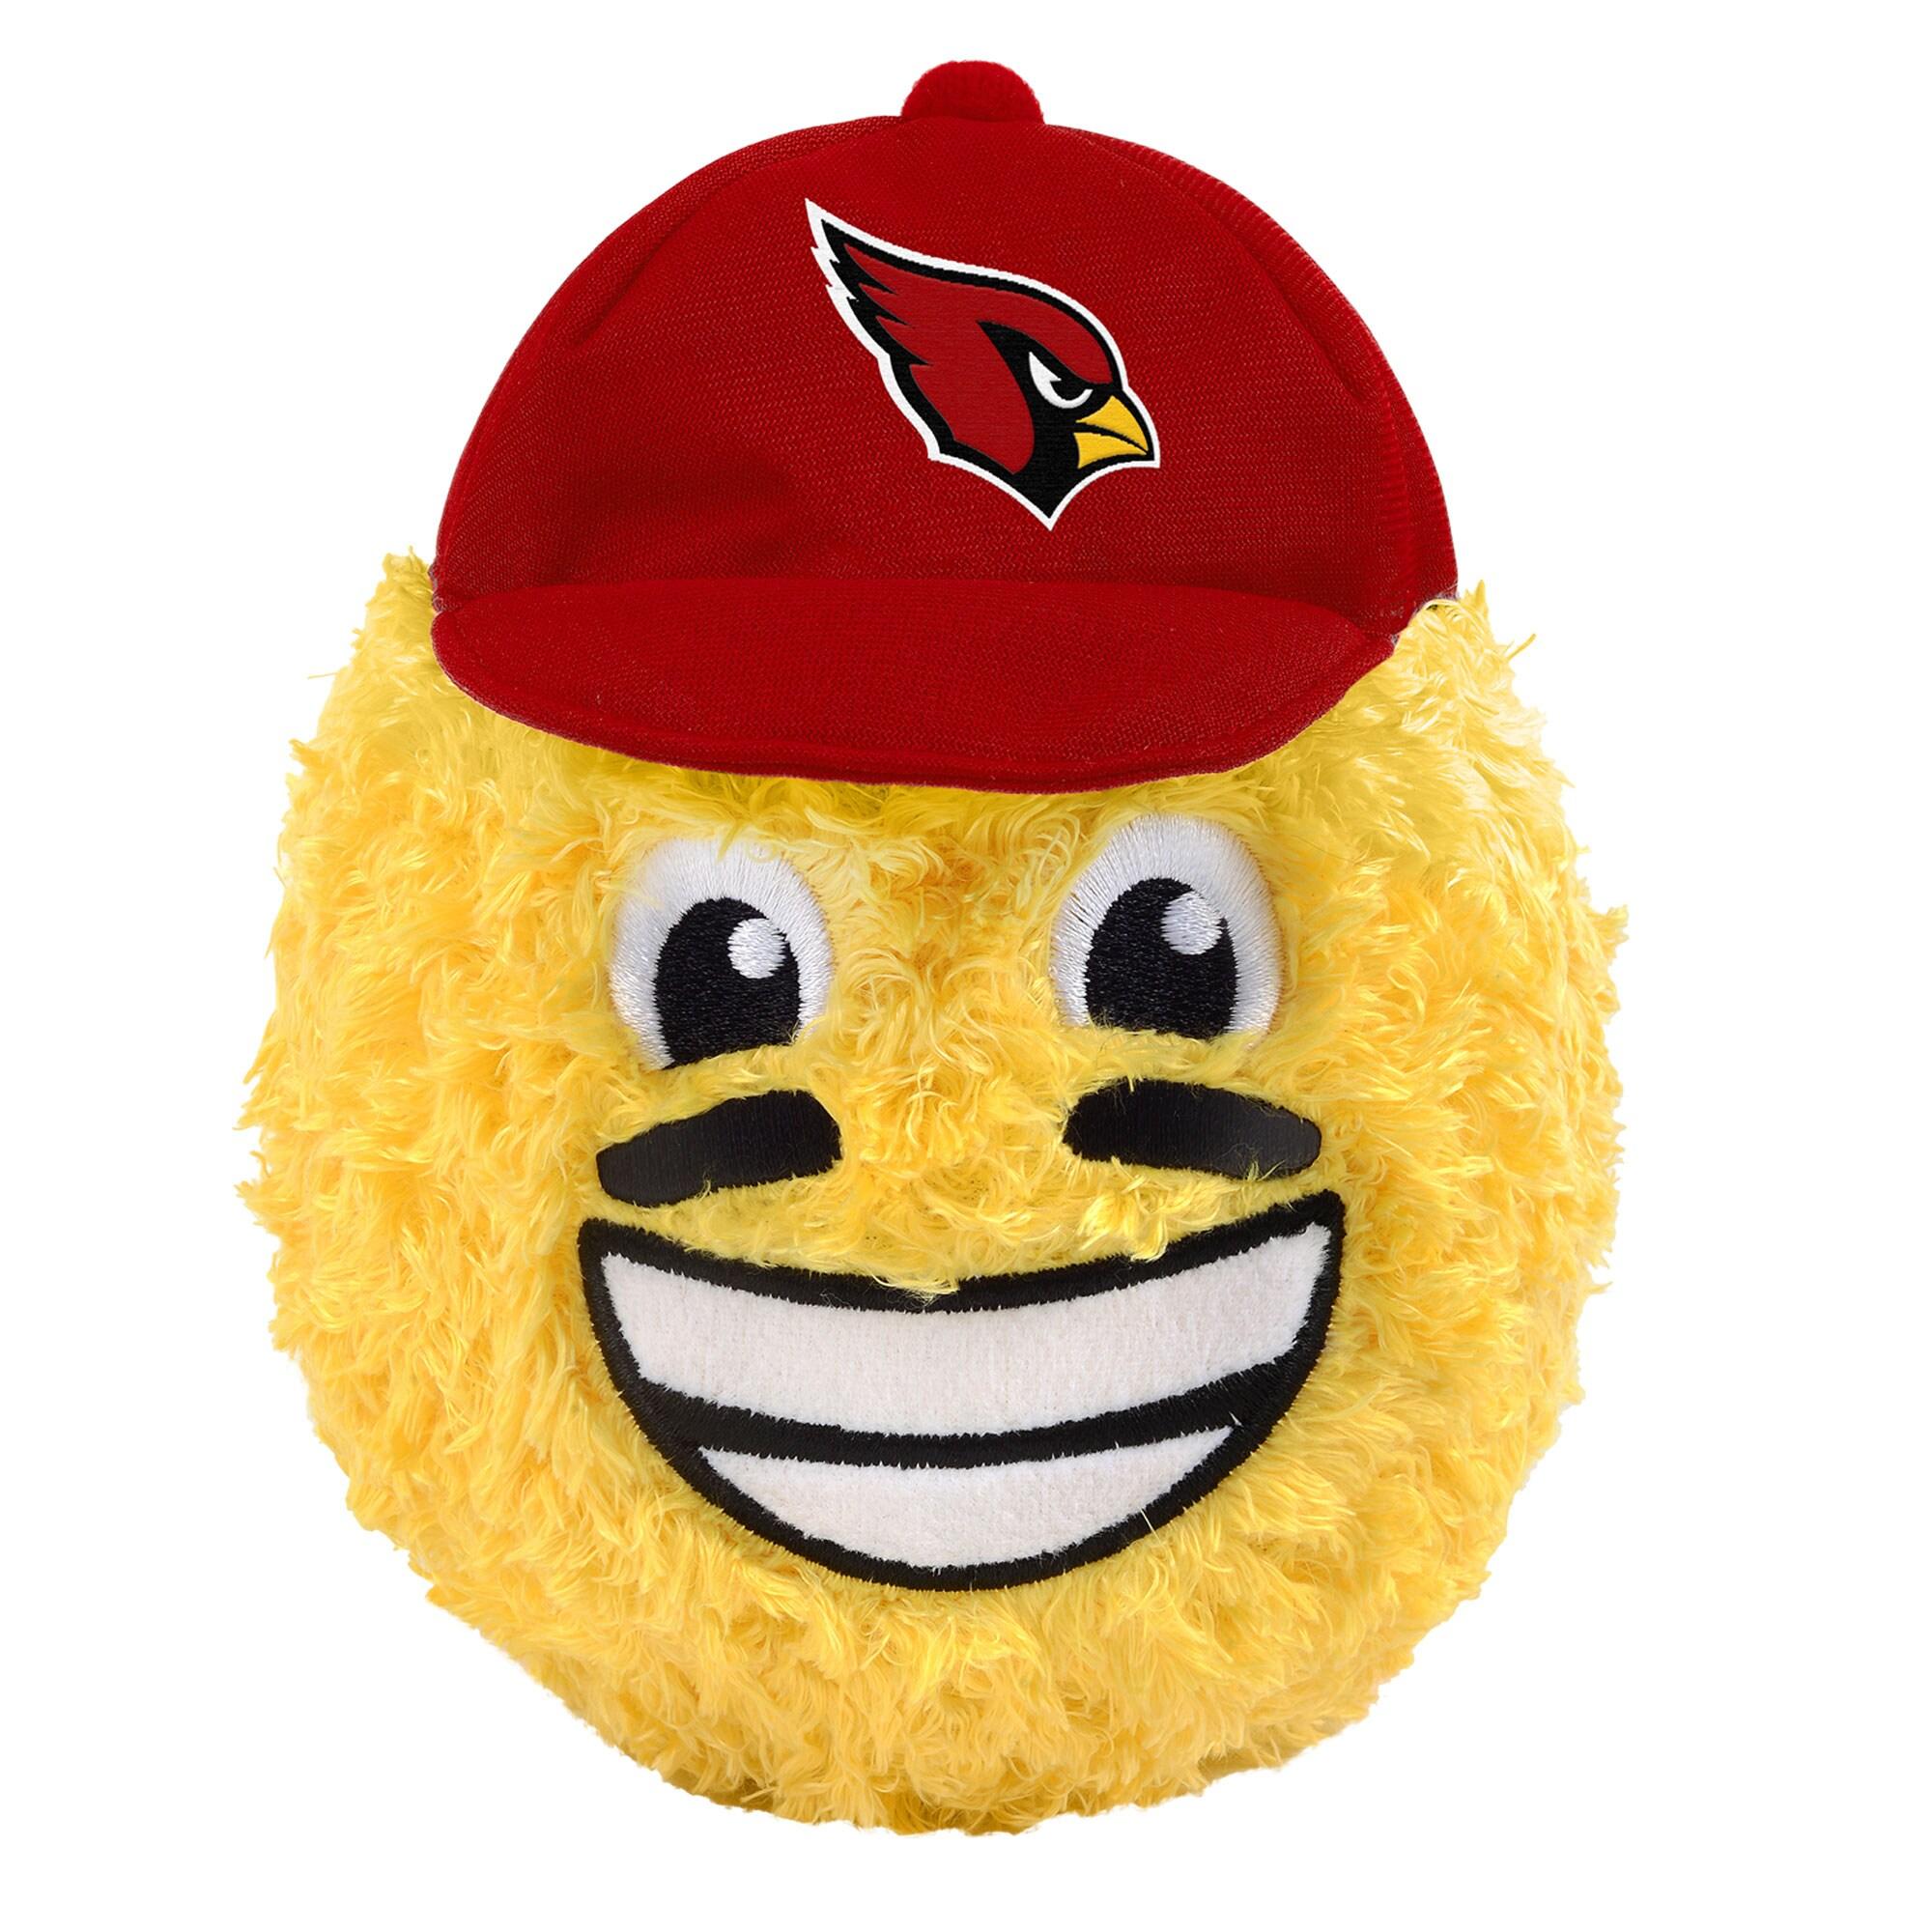 "Arizona Cardinals 5"" Eye Black Teamoji Plush Toy"